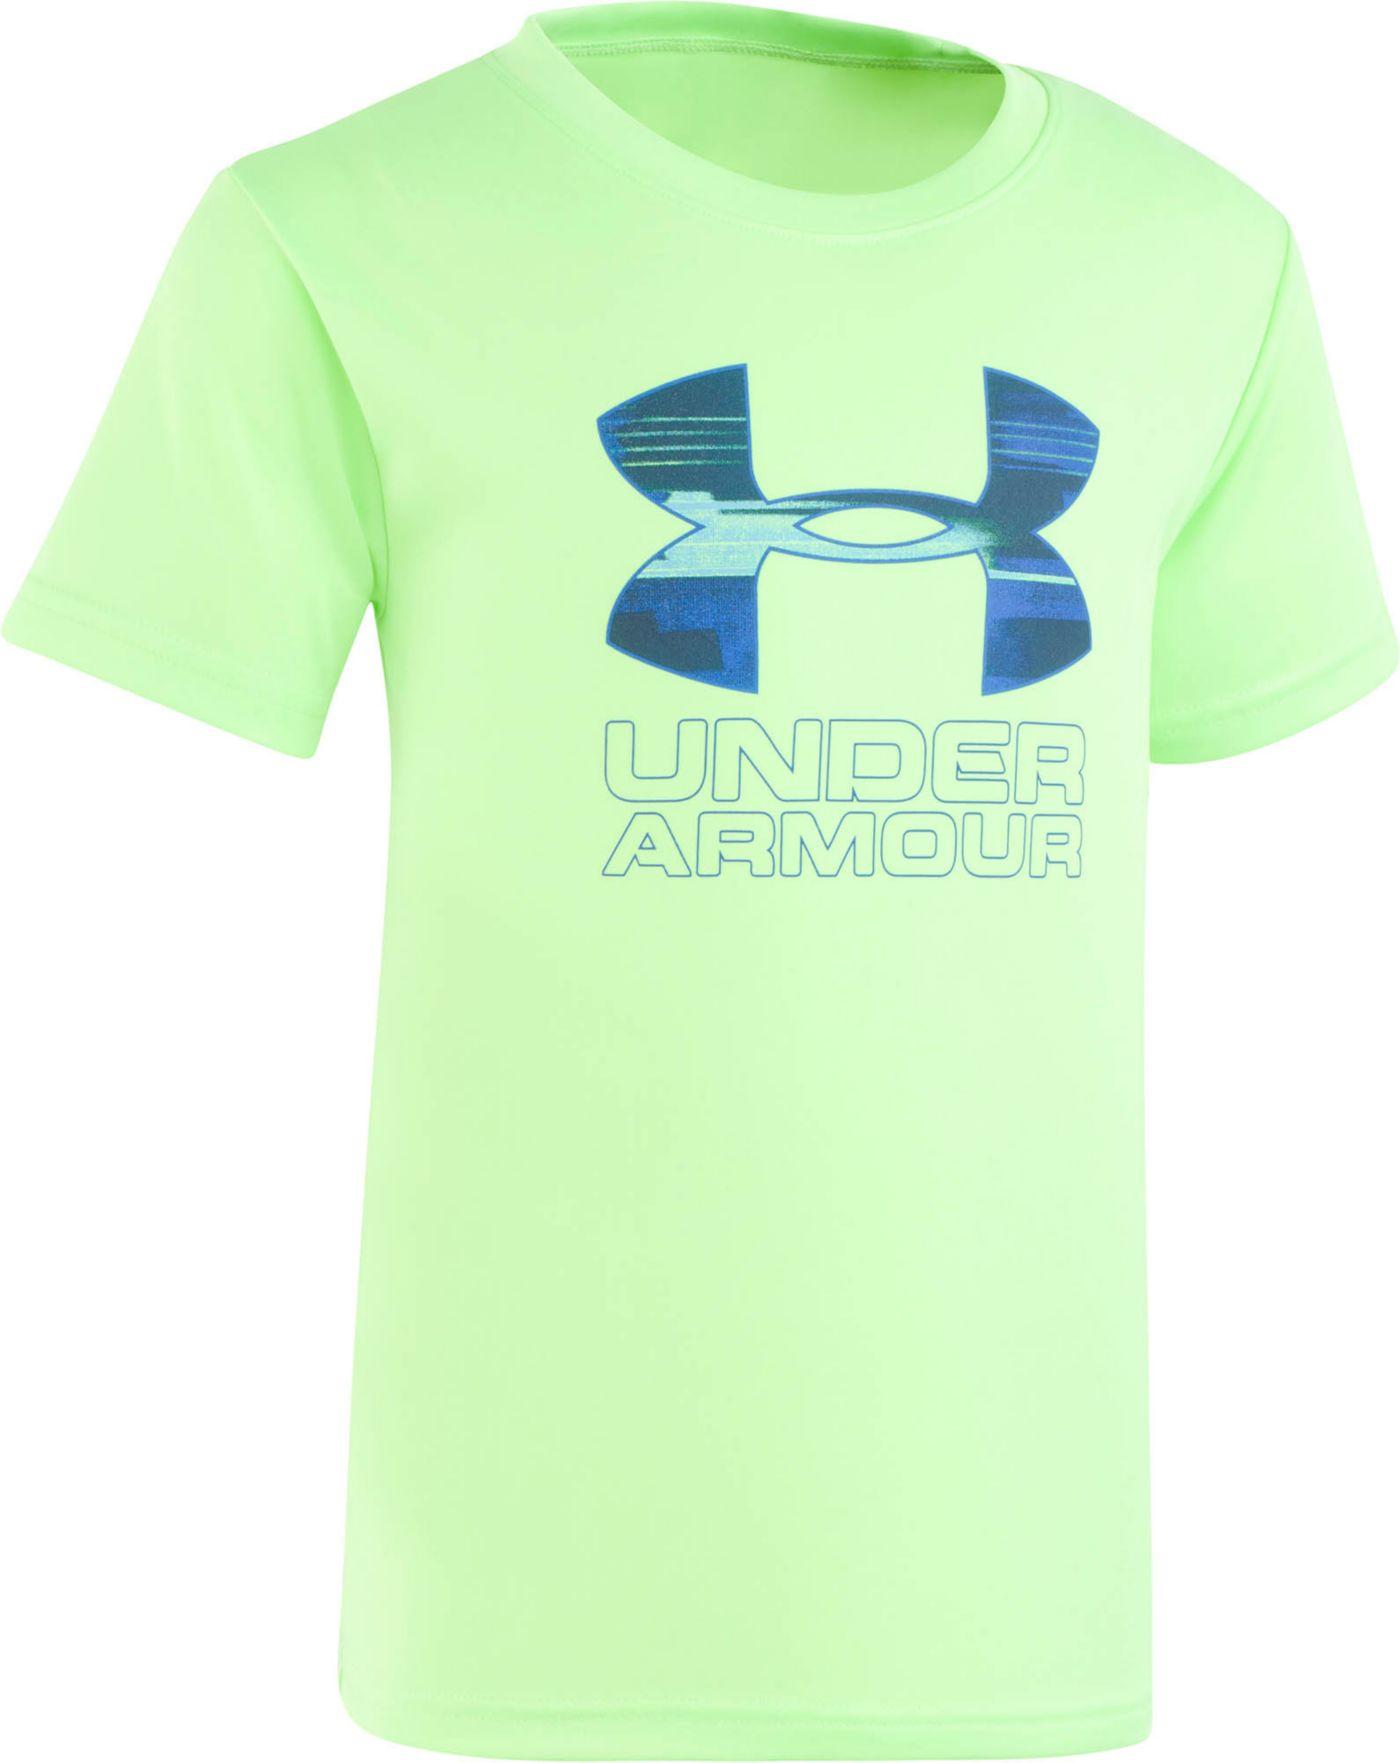 Under Armour Little Boys' Boys' Latitude Big Logo T-Shirt